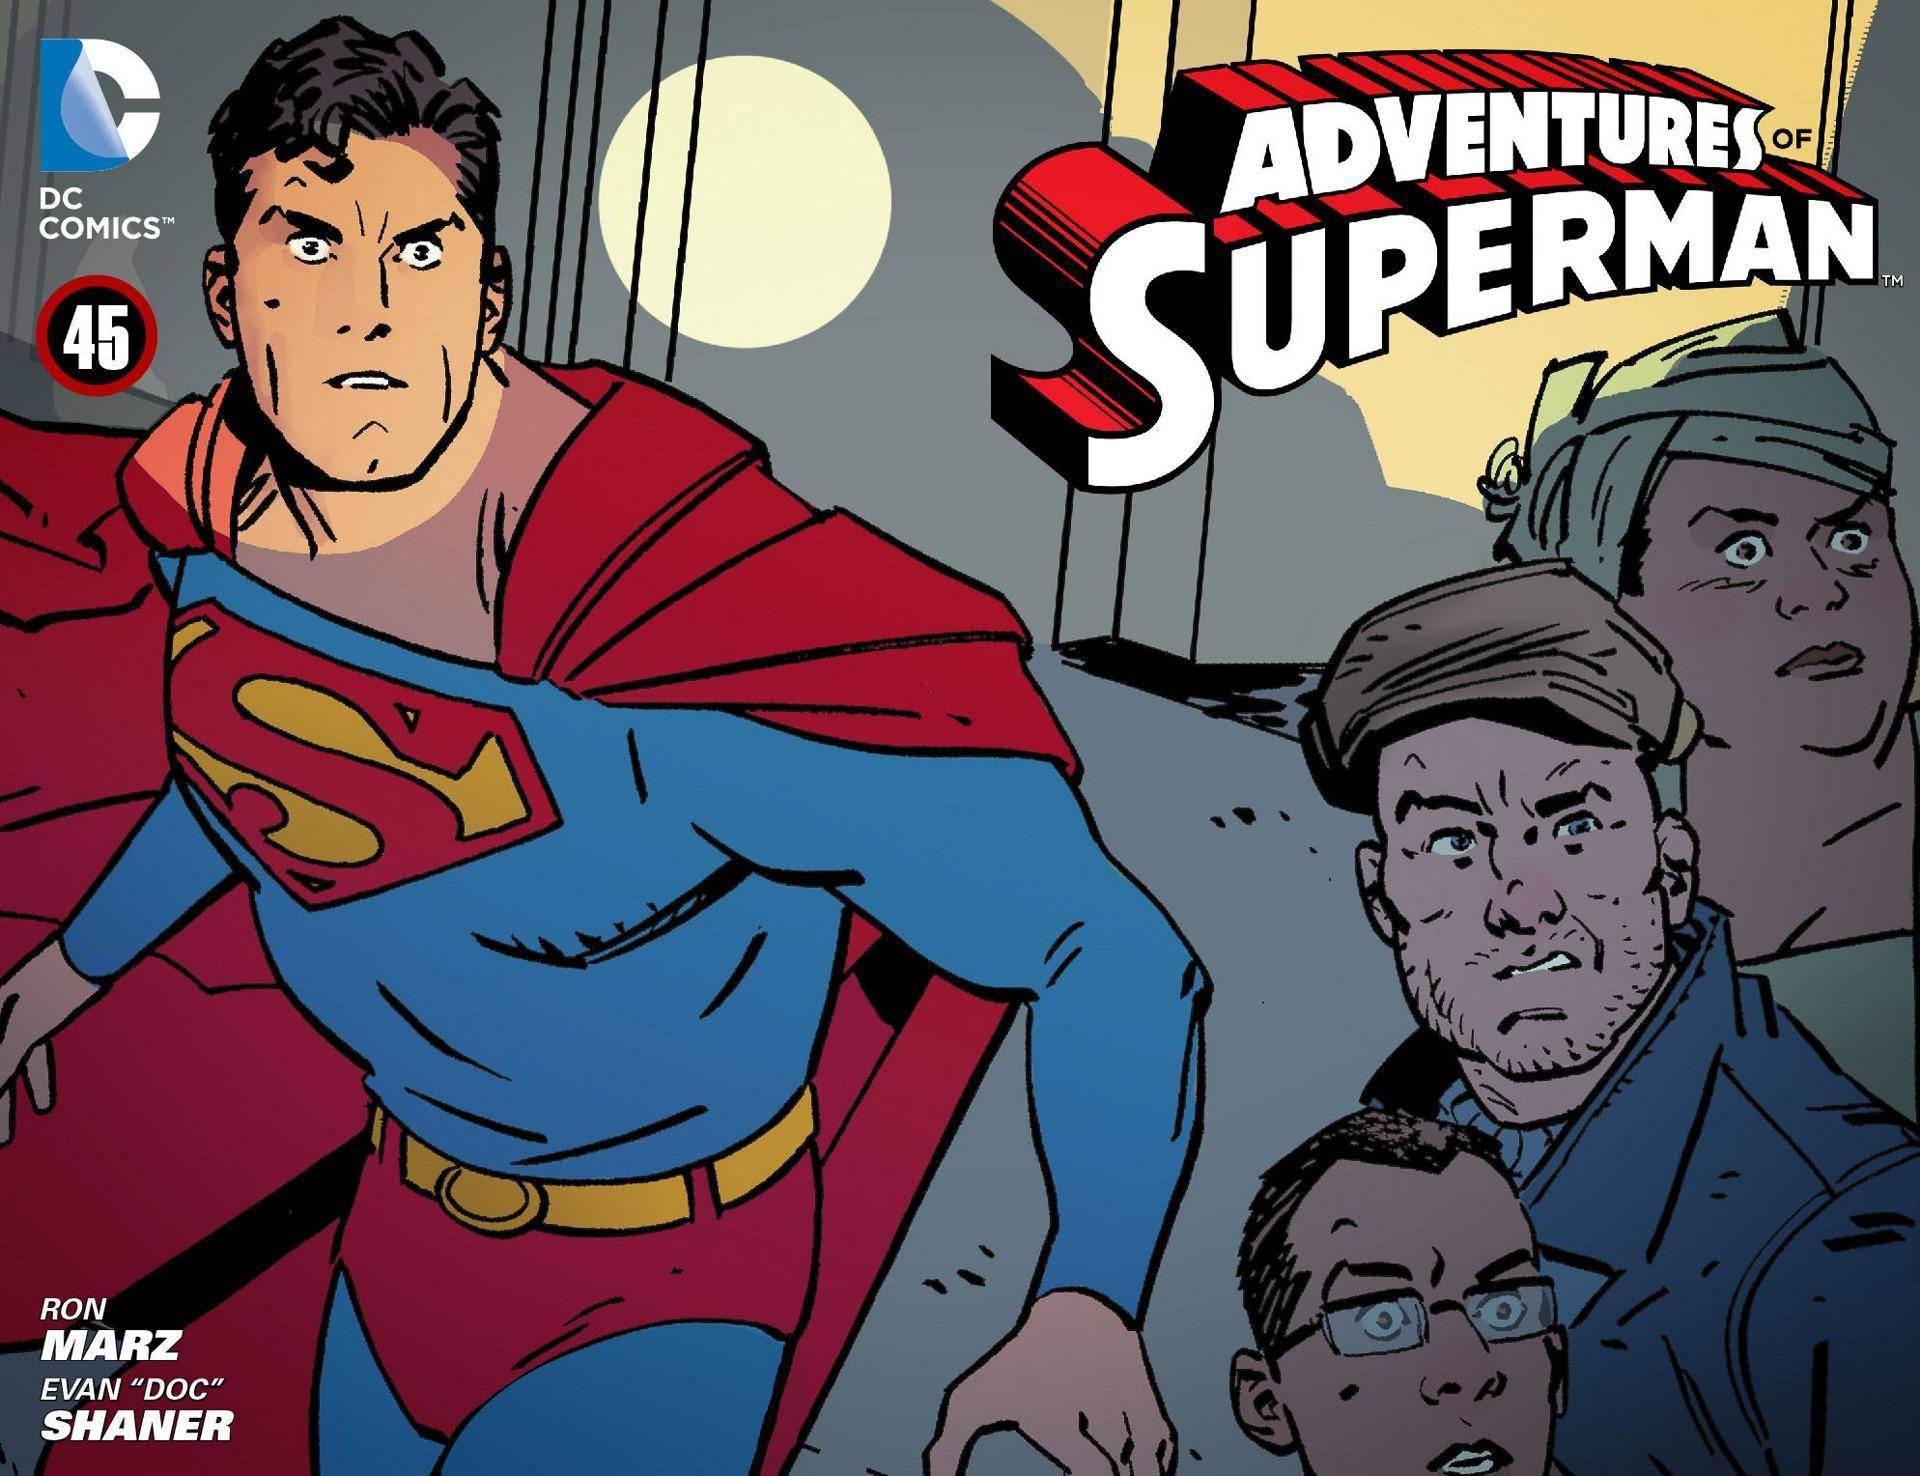 Adventures of Superman 045 2014 Digital